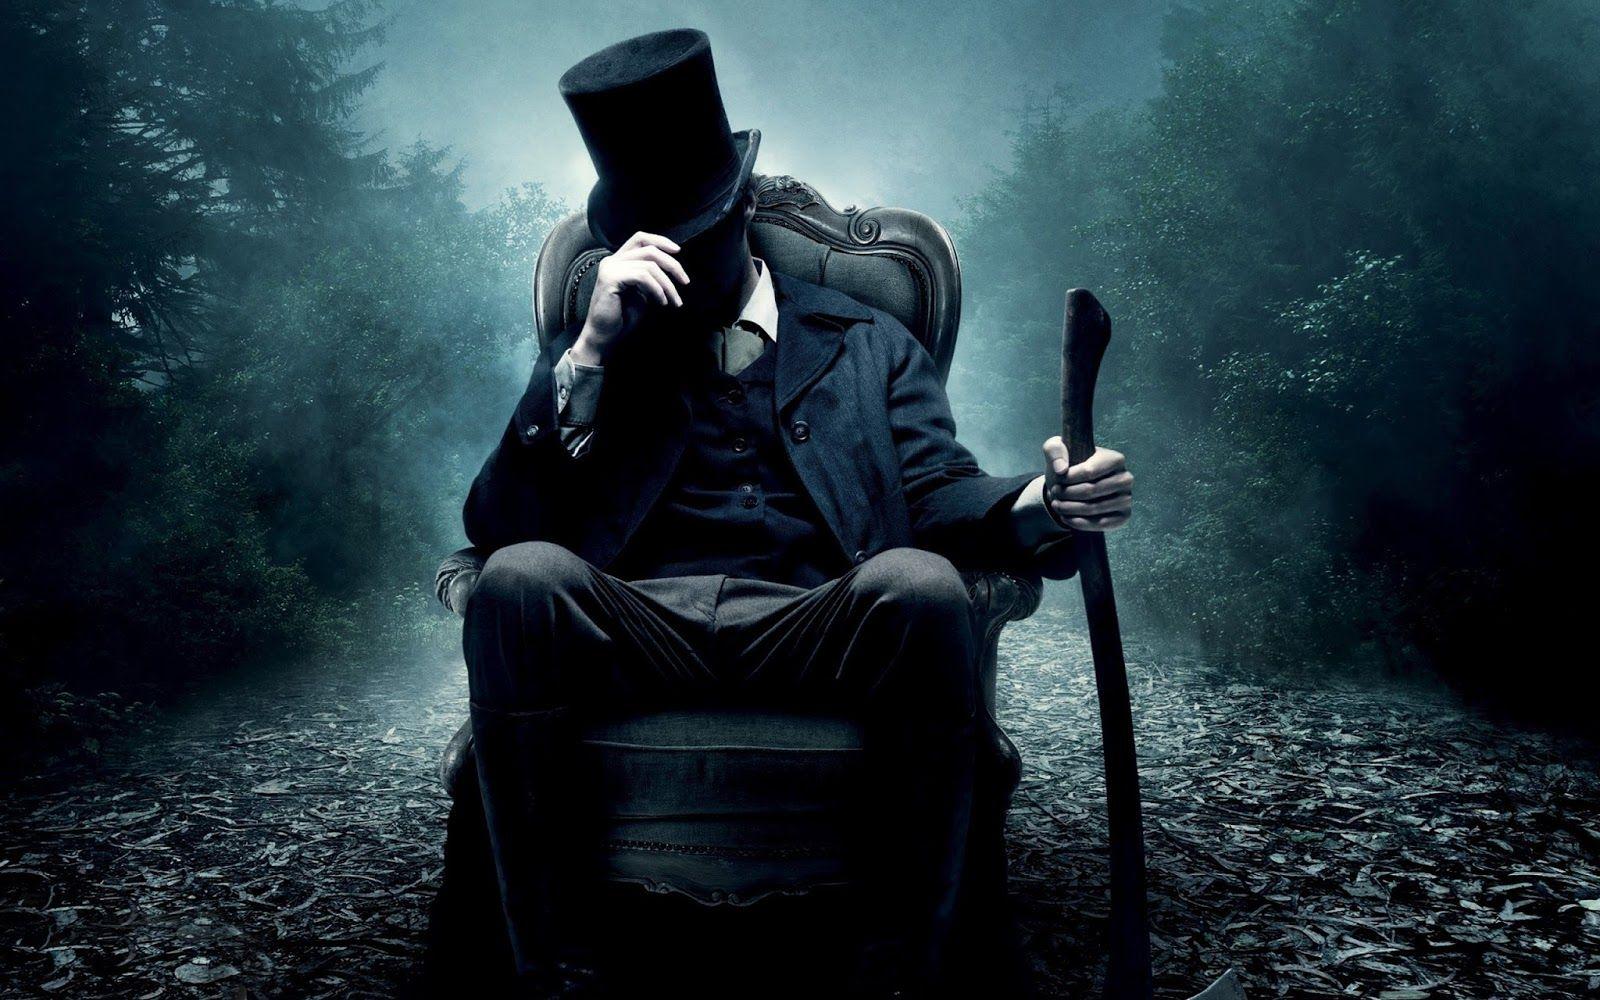 """Abraham Lincoln: Cazador de vampiros"" tendrá secuela en forma de serie"